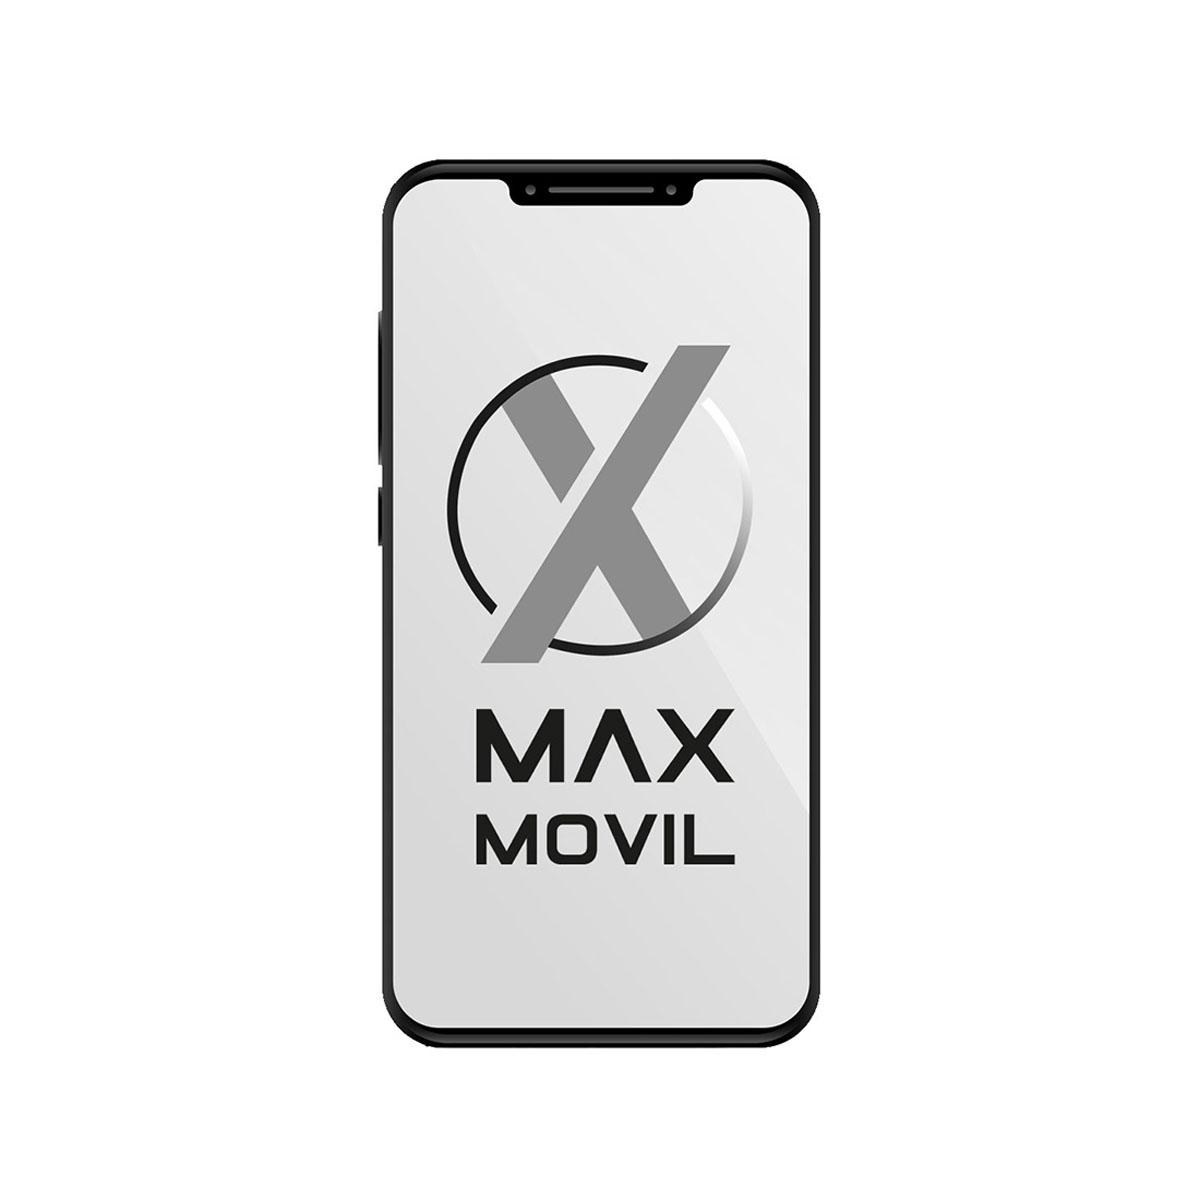 Innjoo Fire 2 Plus LTE Rose Gold libre en MAXmovil